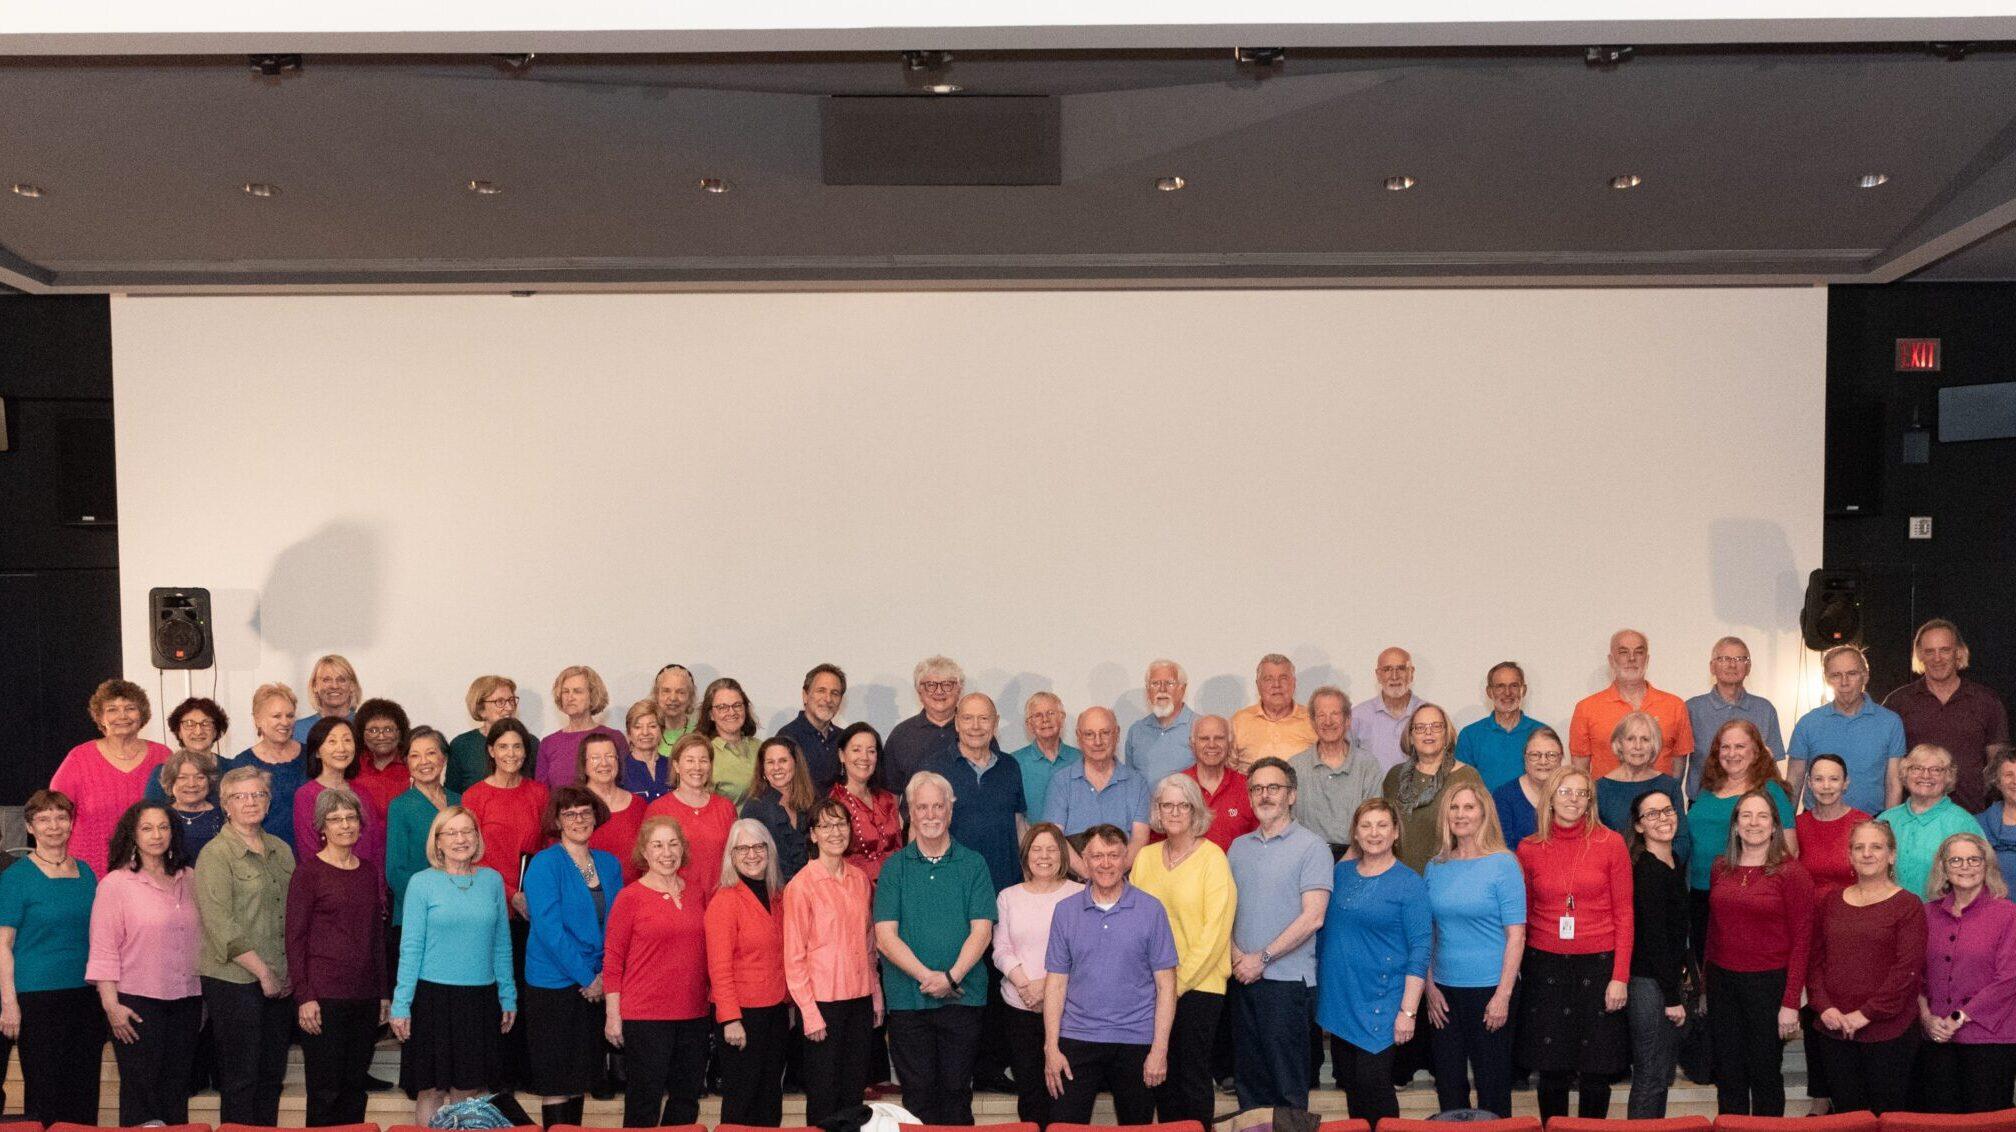 A group portrait of senior participants wearing colorful shirts